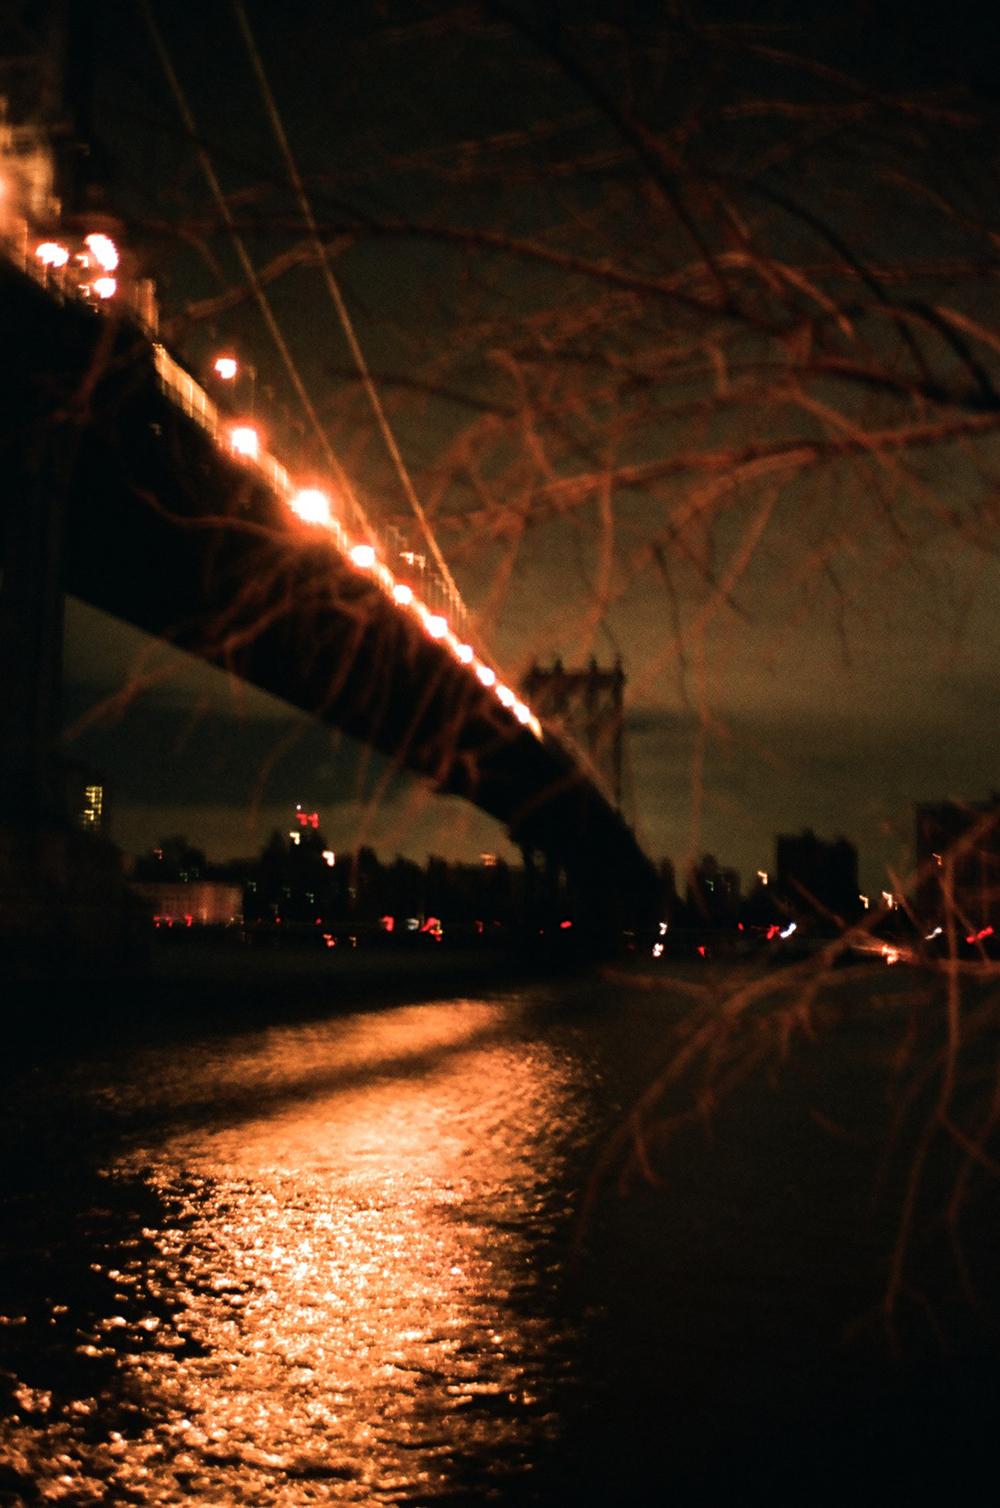 bridgedockblurwb.jpg